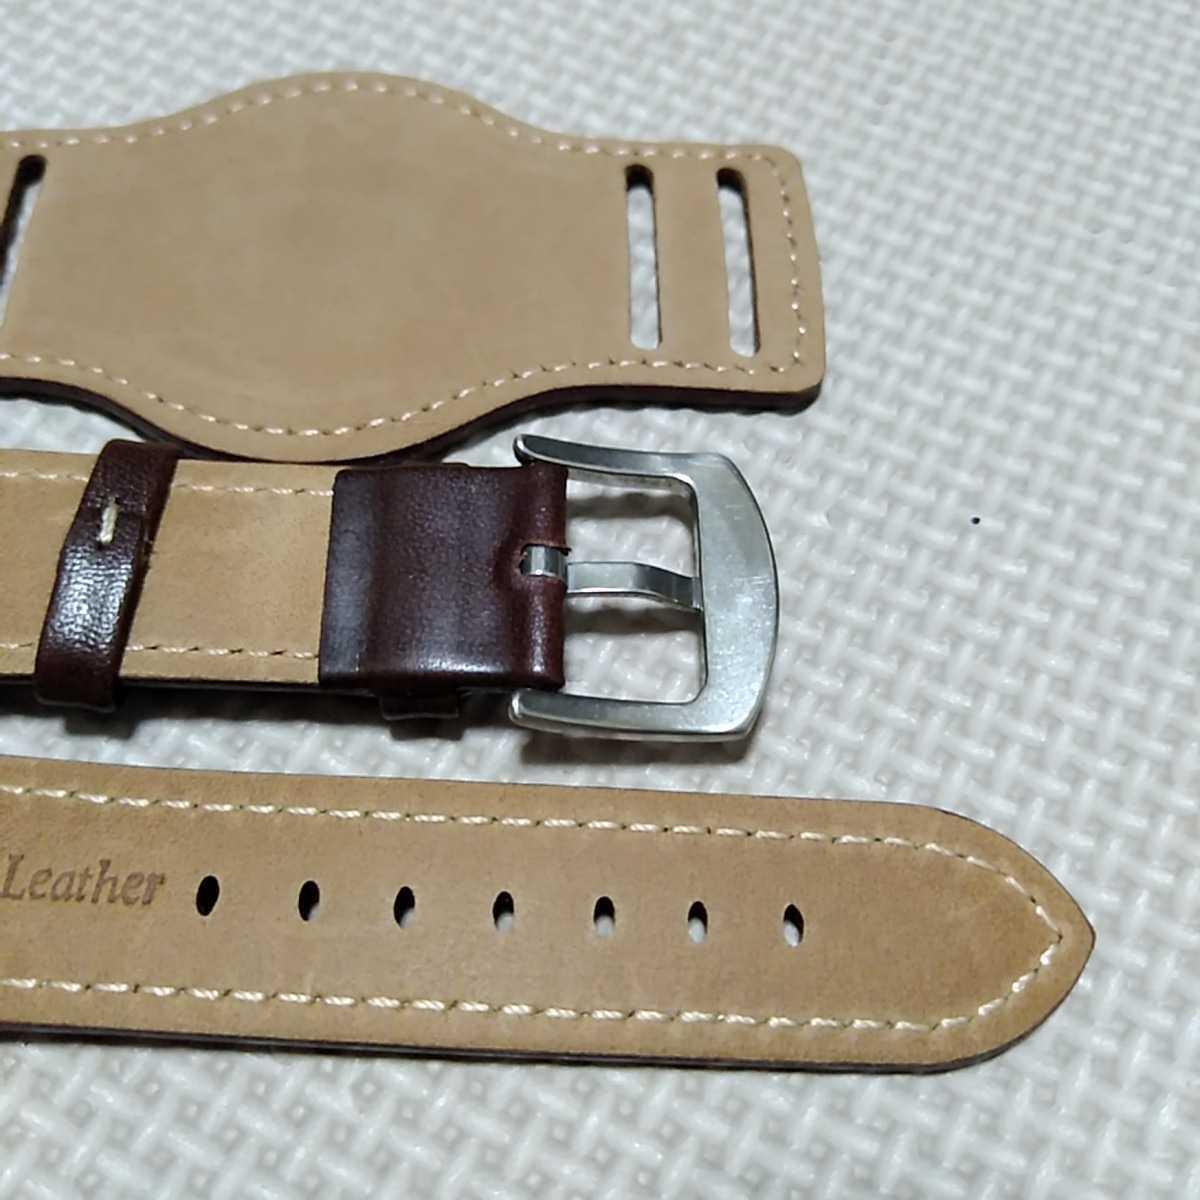 No50 ブンド BUND 本革レザーベルト 腕時計ベルト 交換用ストラップ ブラウン 22mm 未使用 高品質 ドイツパイロット 空軍_画像6